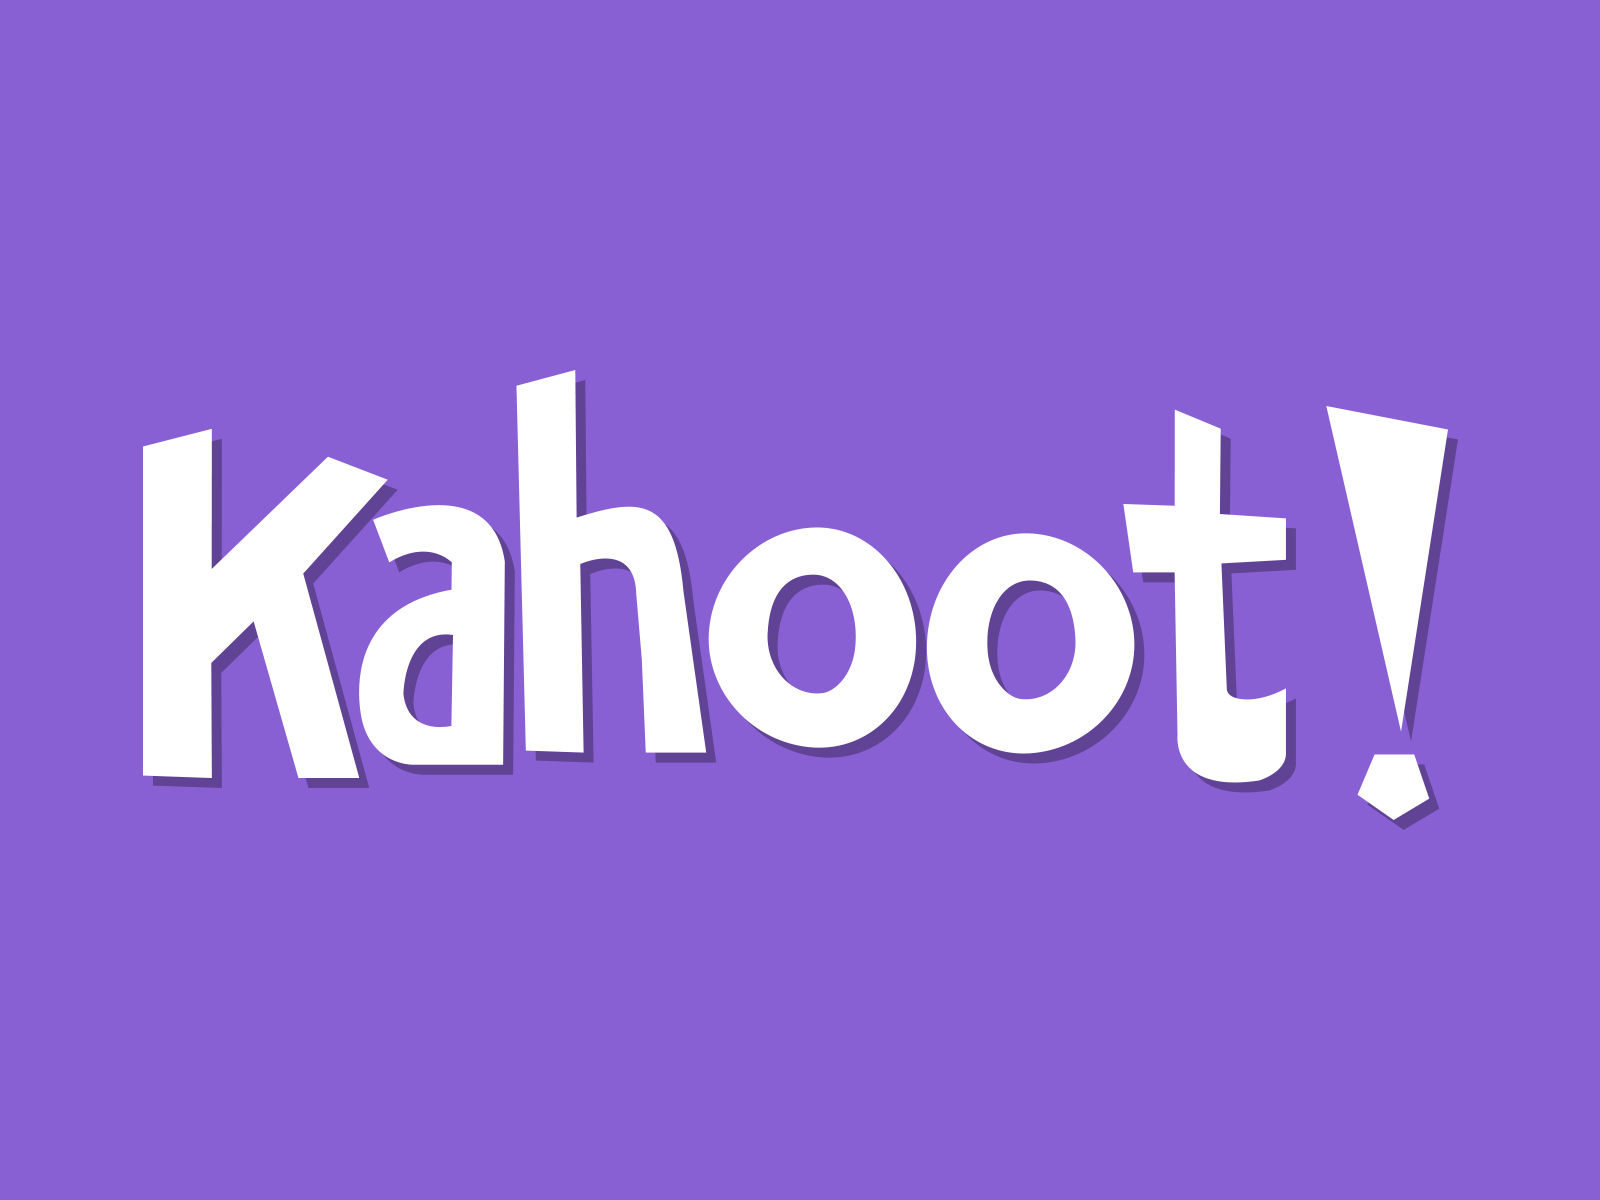 kahoot_logo_purple.png